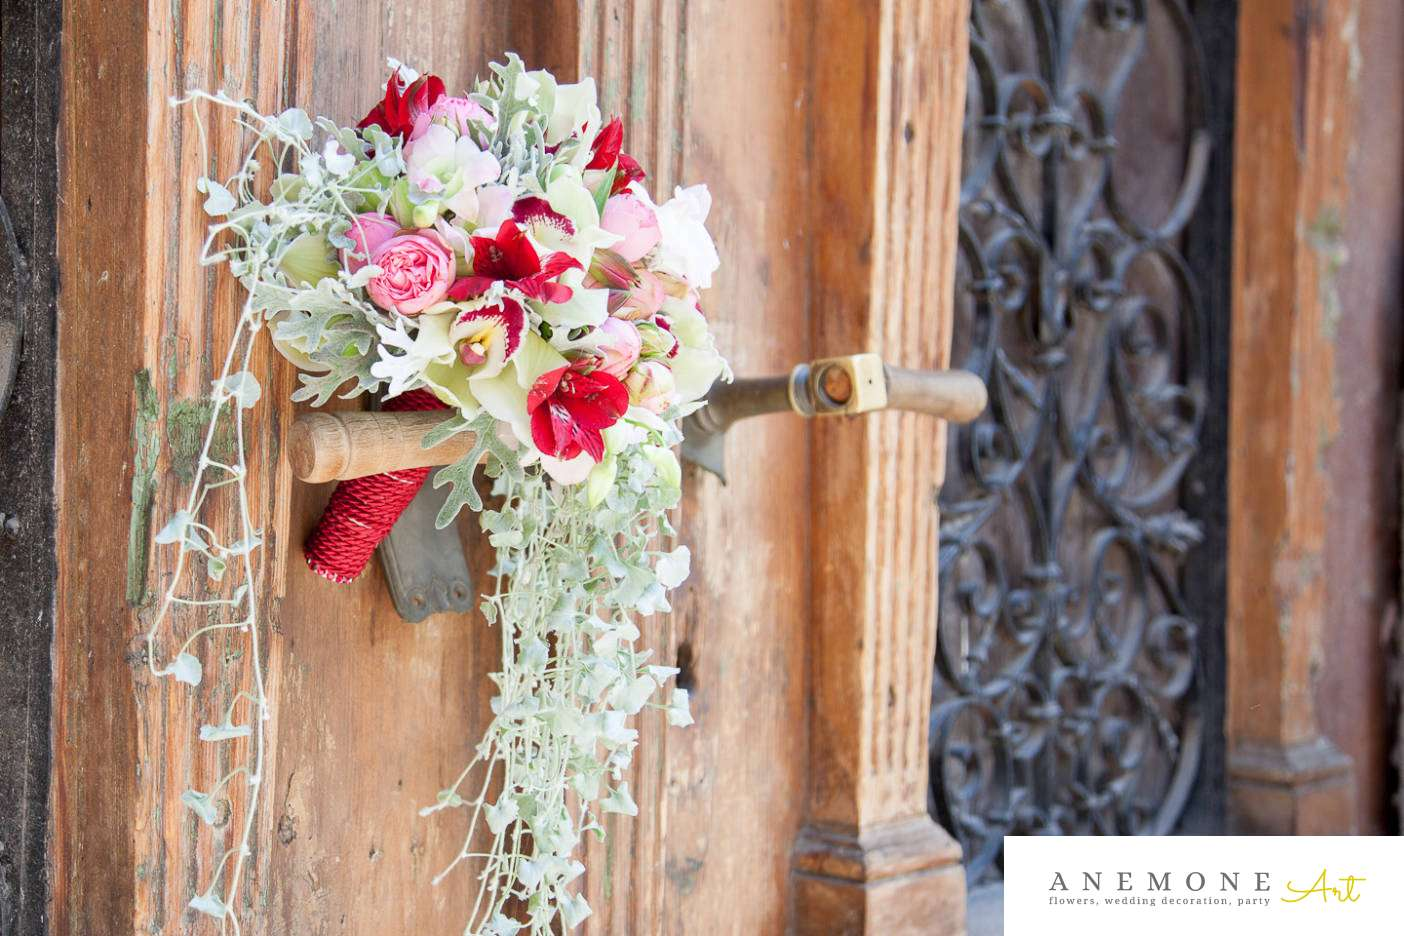 Poza, foto cu Flori de nunta alstroemeria, buchet cununie, lalele, orhidee, rosu, trandafiri englezesti, verde, vintage in Arad, Timisoara, Oradea (wedding flowers, bouquets) nunta Arad, Timisoara, Oradea